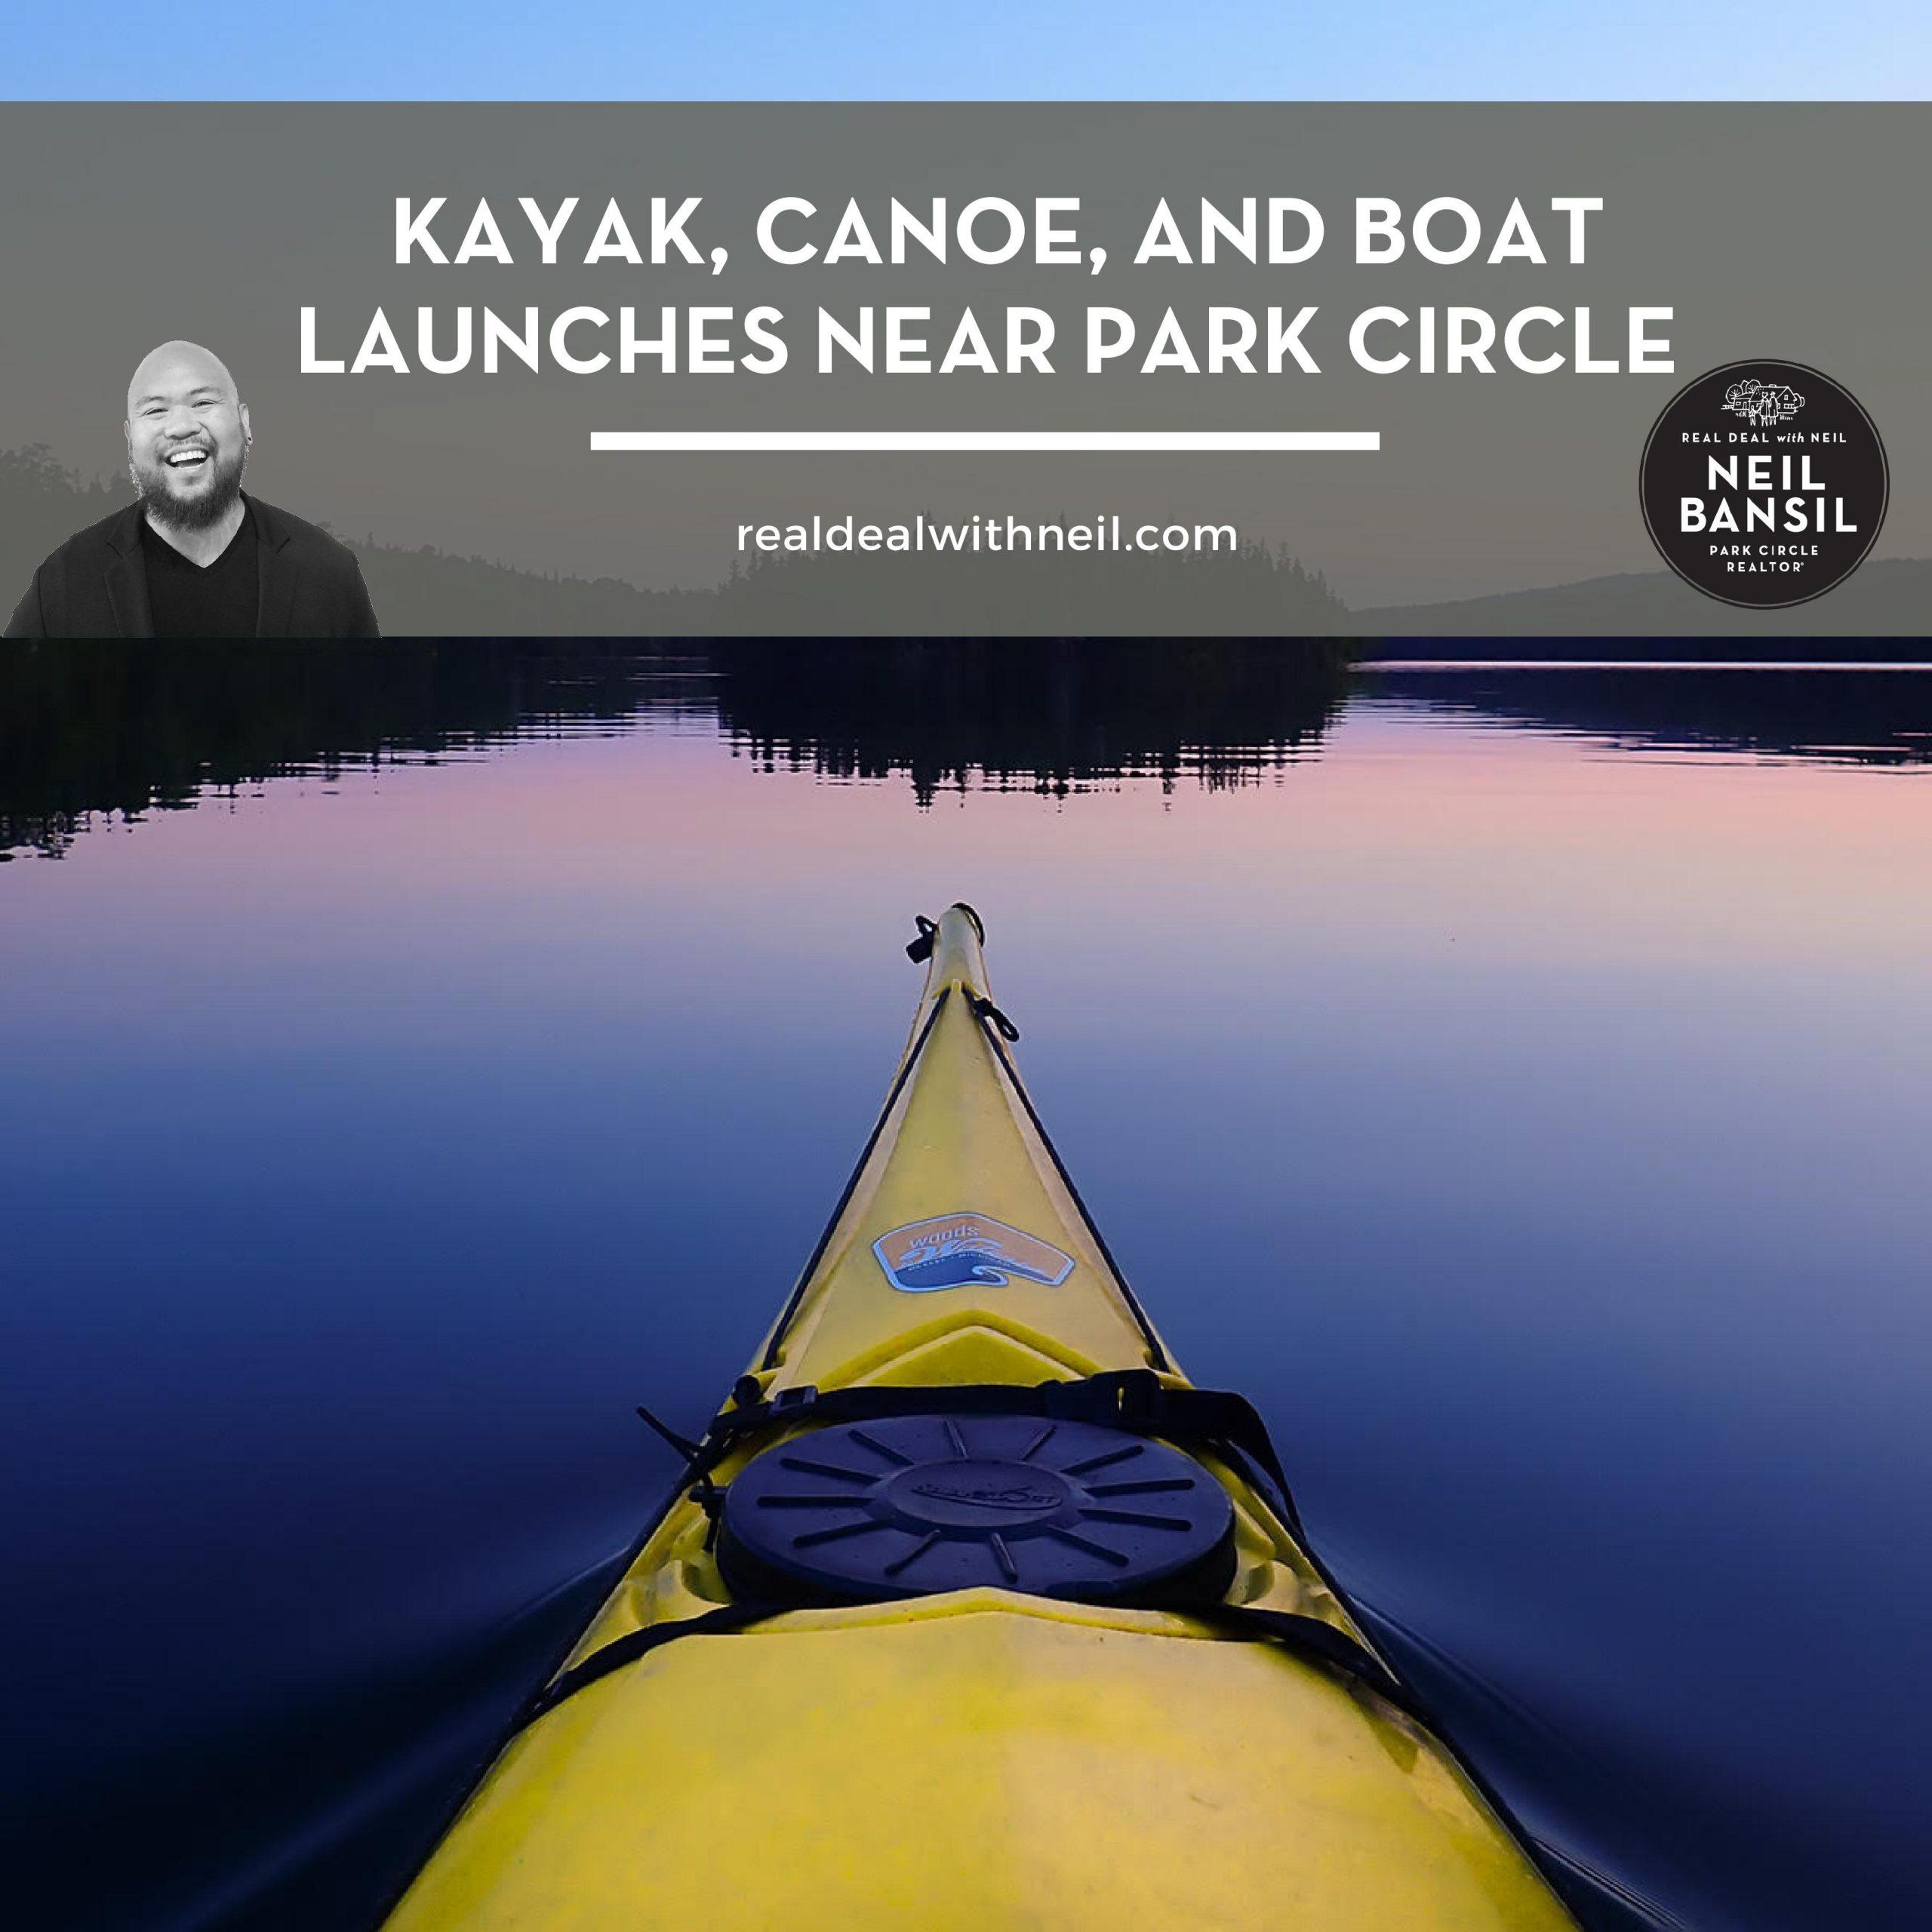 Kayak, Canoe, and Boat Launches near Park Circle